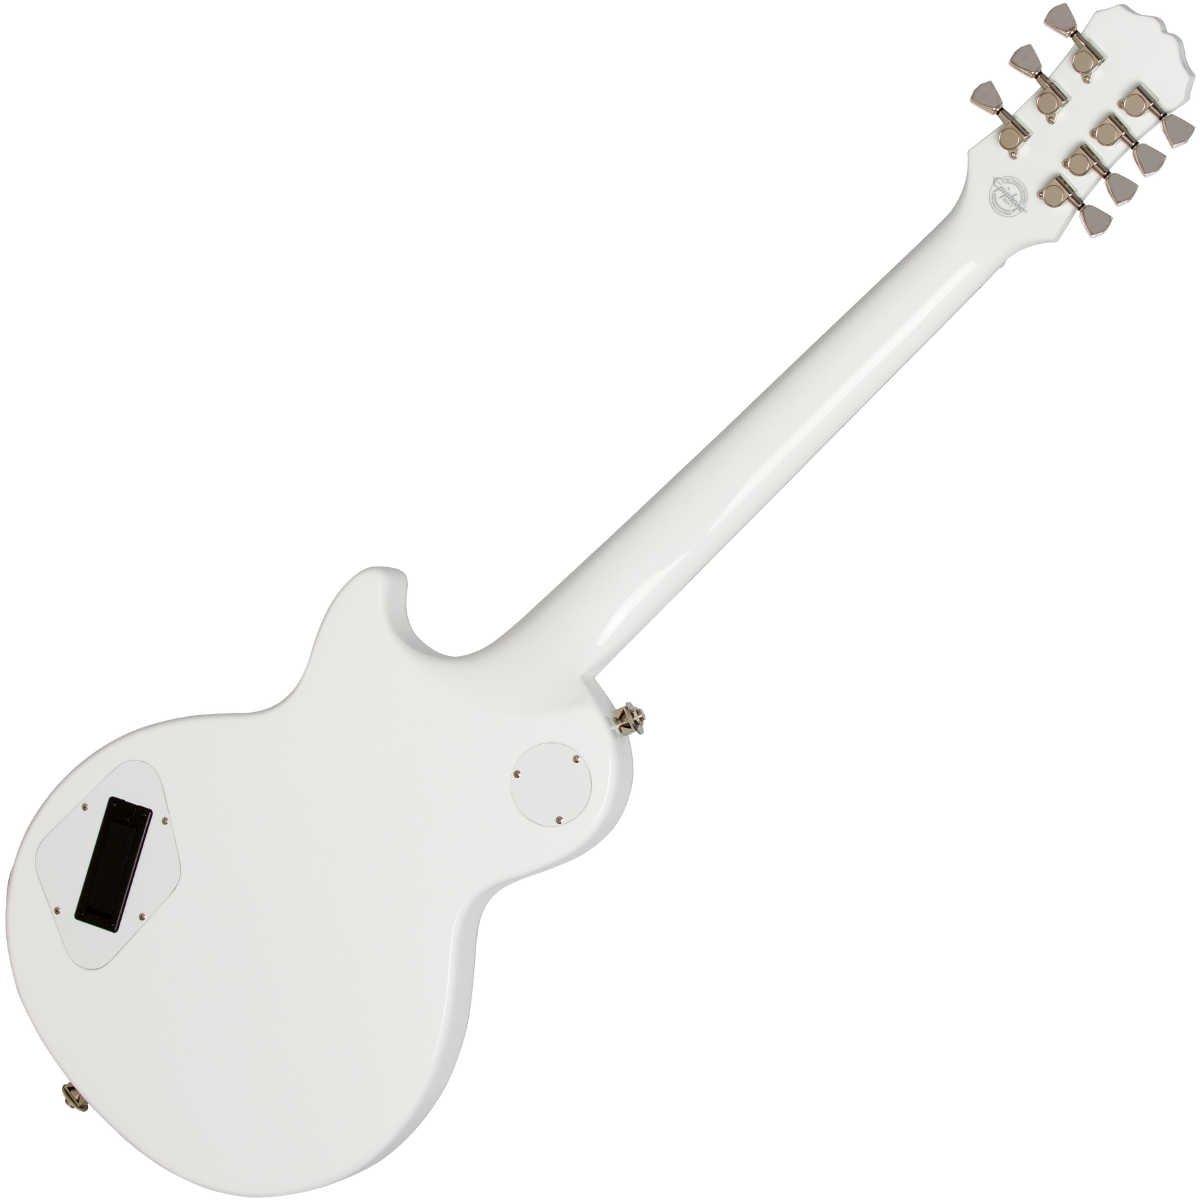 hight resolution of epiphone sheraton wiring diagram wiring diagram databaseepiphone bass guitar wiring diagram best wiring library vintage les